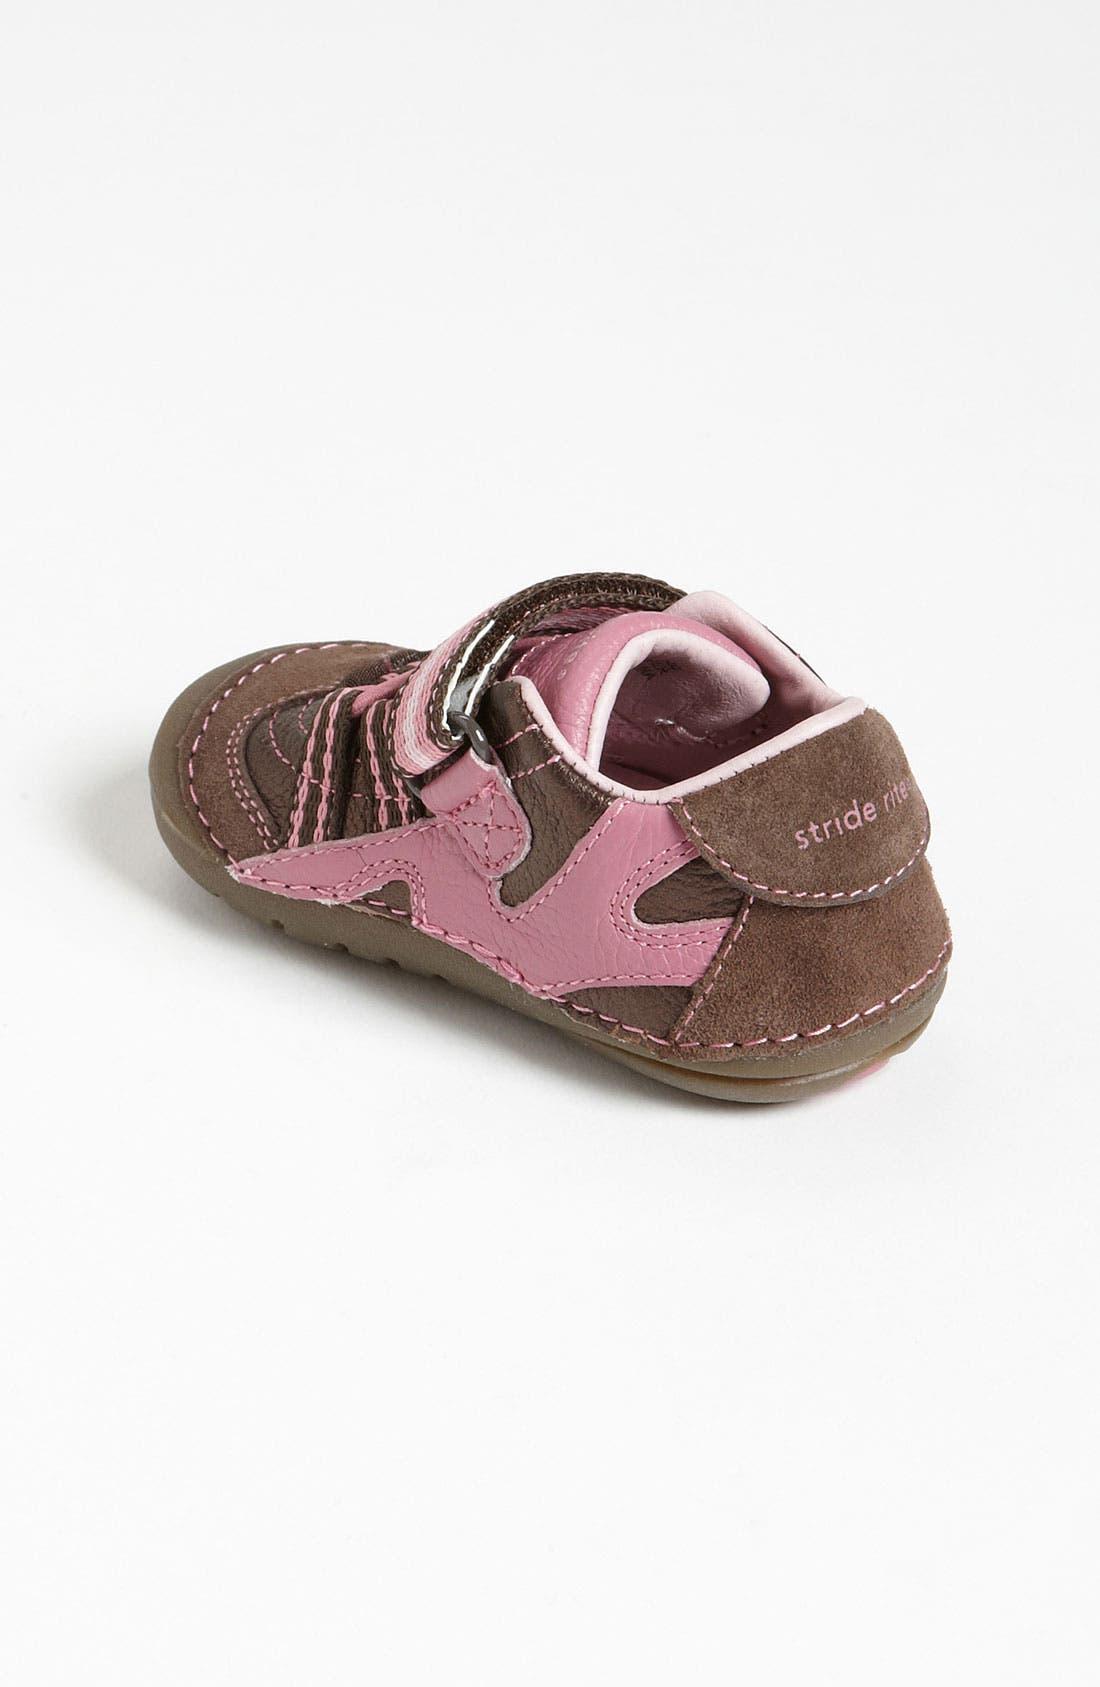 Alternate Image 2  - Stride Rite 'Stephanie' Sneaker (Baby & Walker)